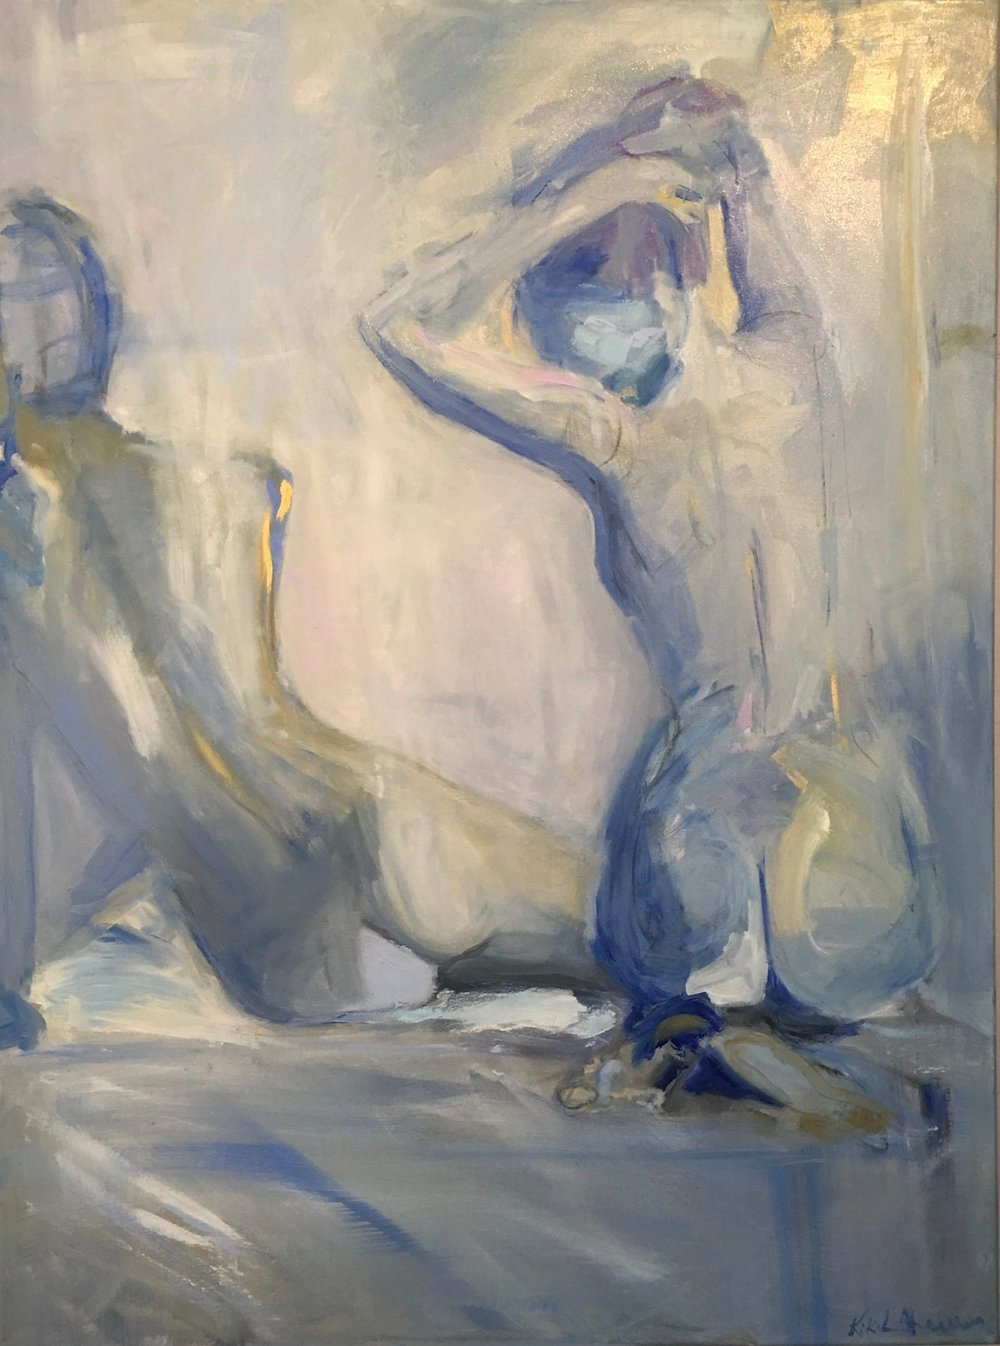 Blue Figurative II, Oil on canvas, 48 x 36